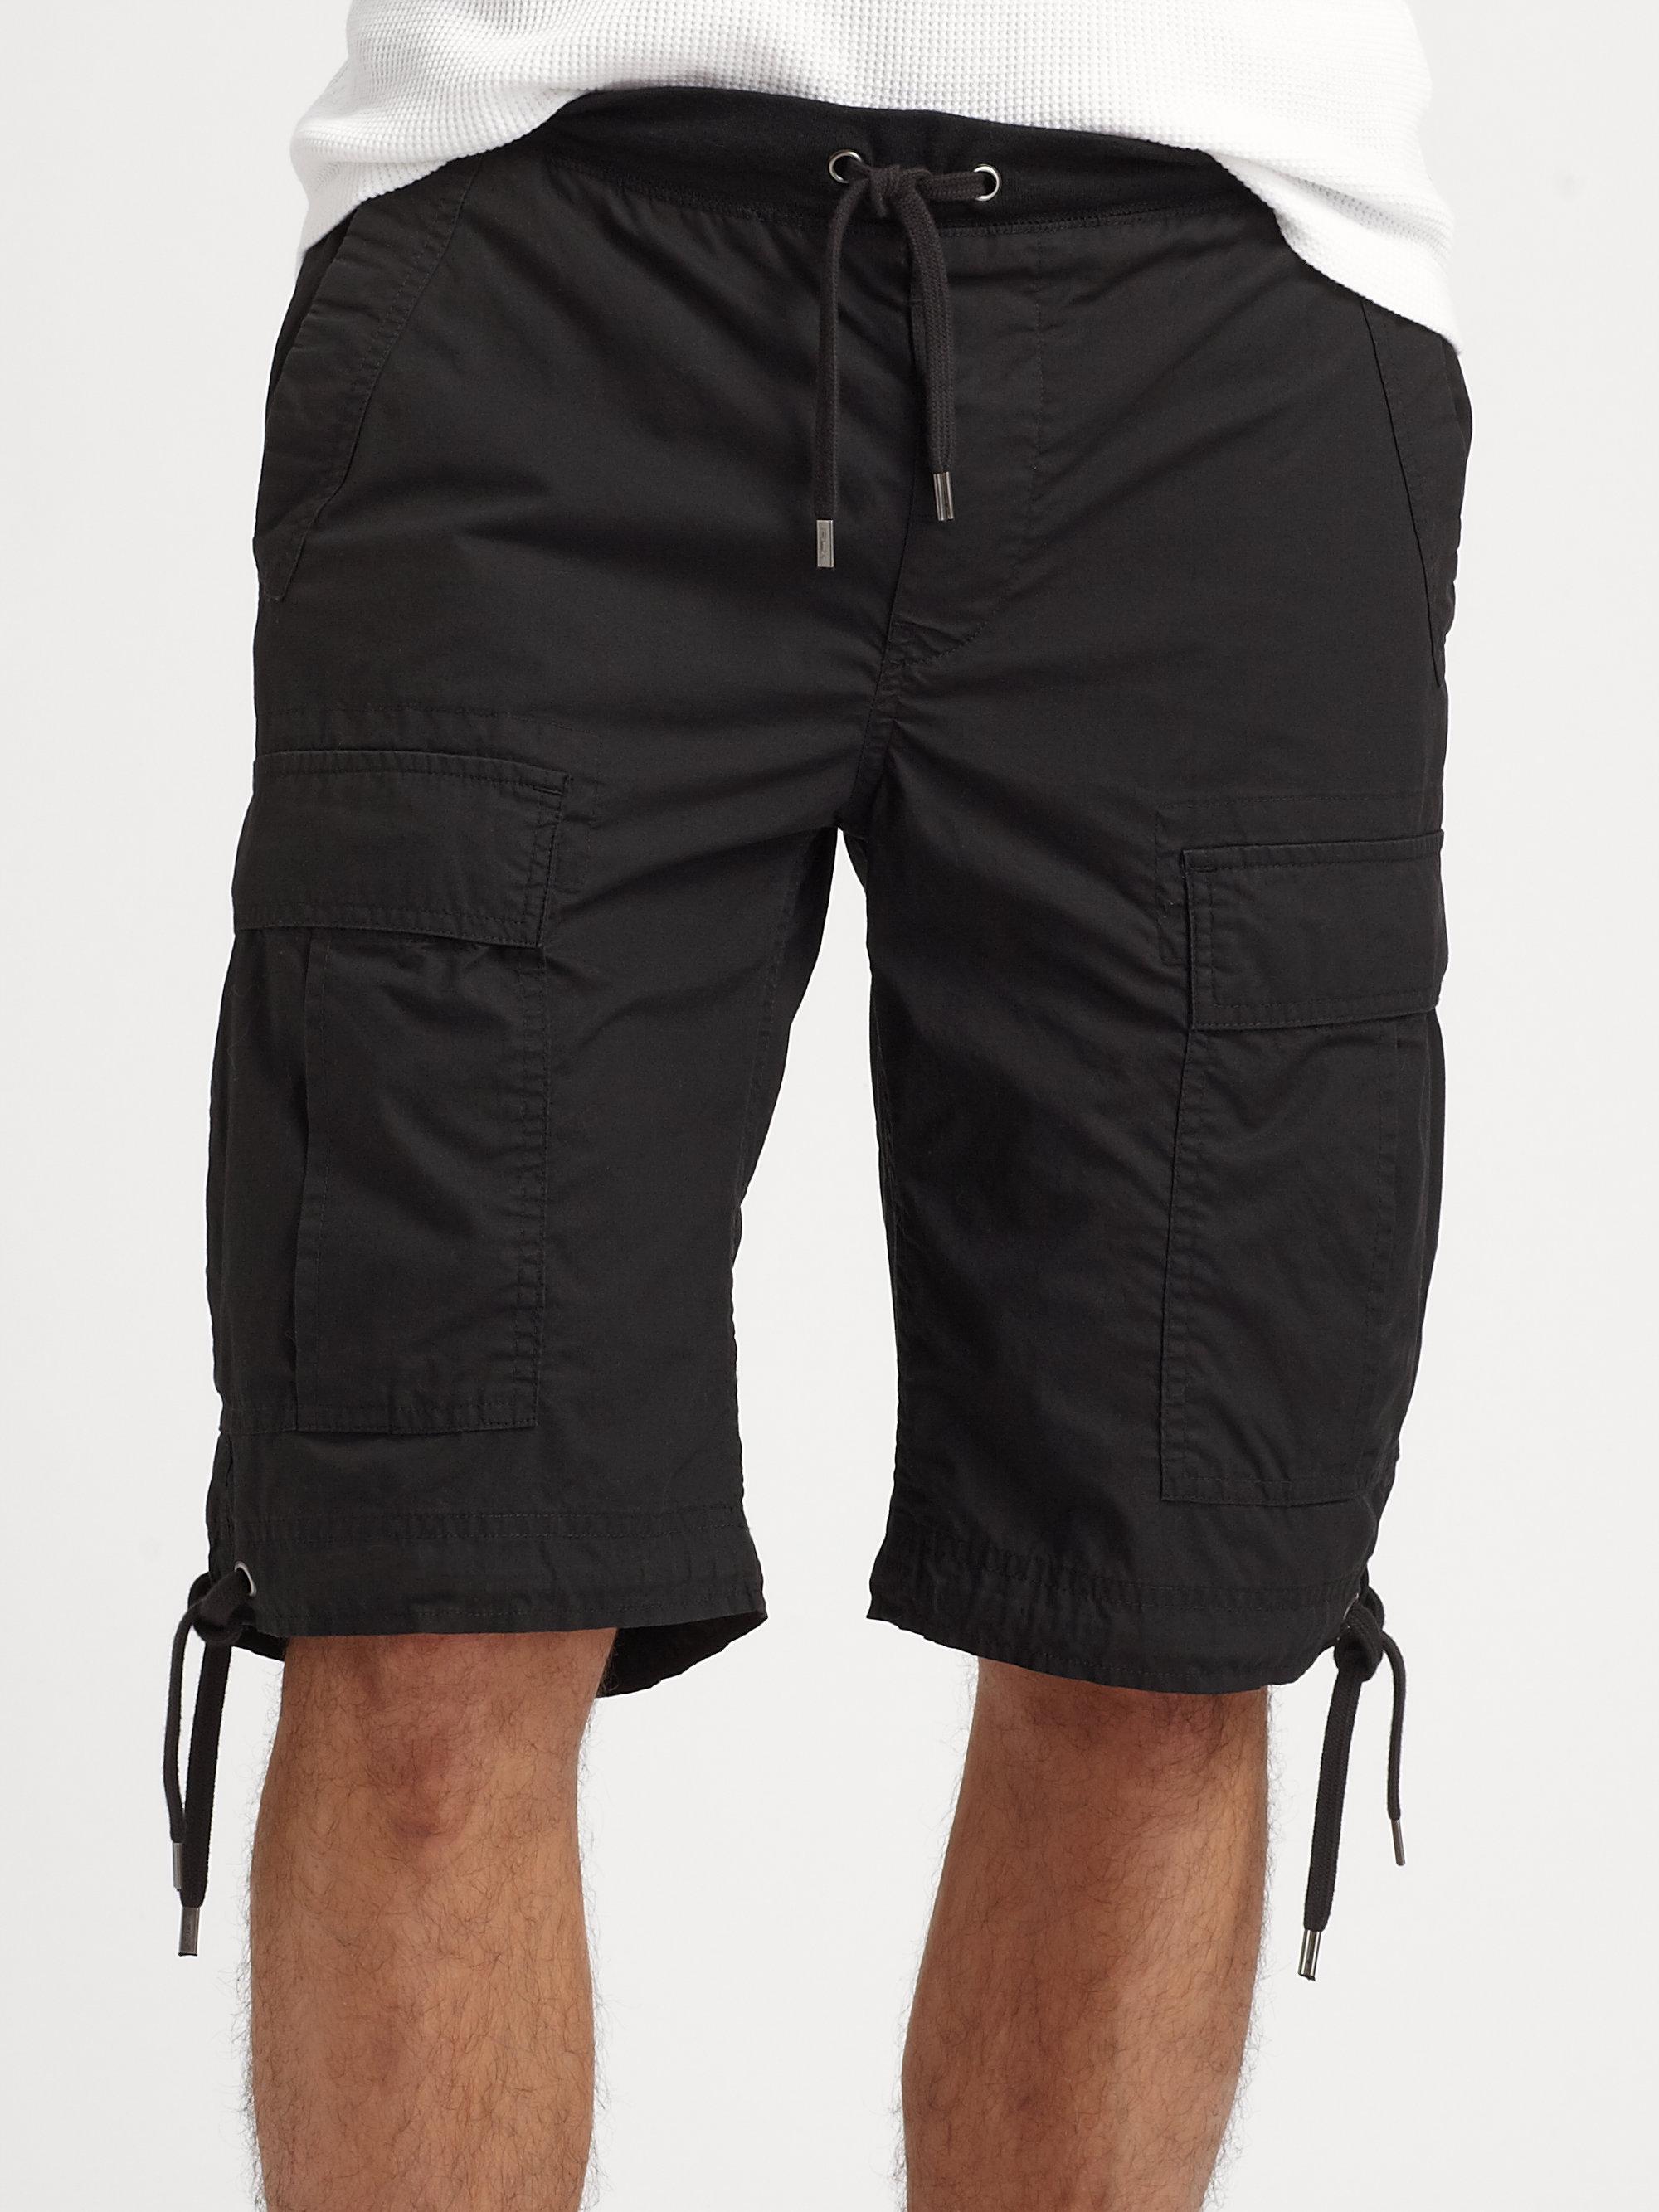 06671115d546 Polo Ralph Lauren Refined Leisure Breathable White Beach Shorts ...